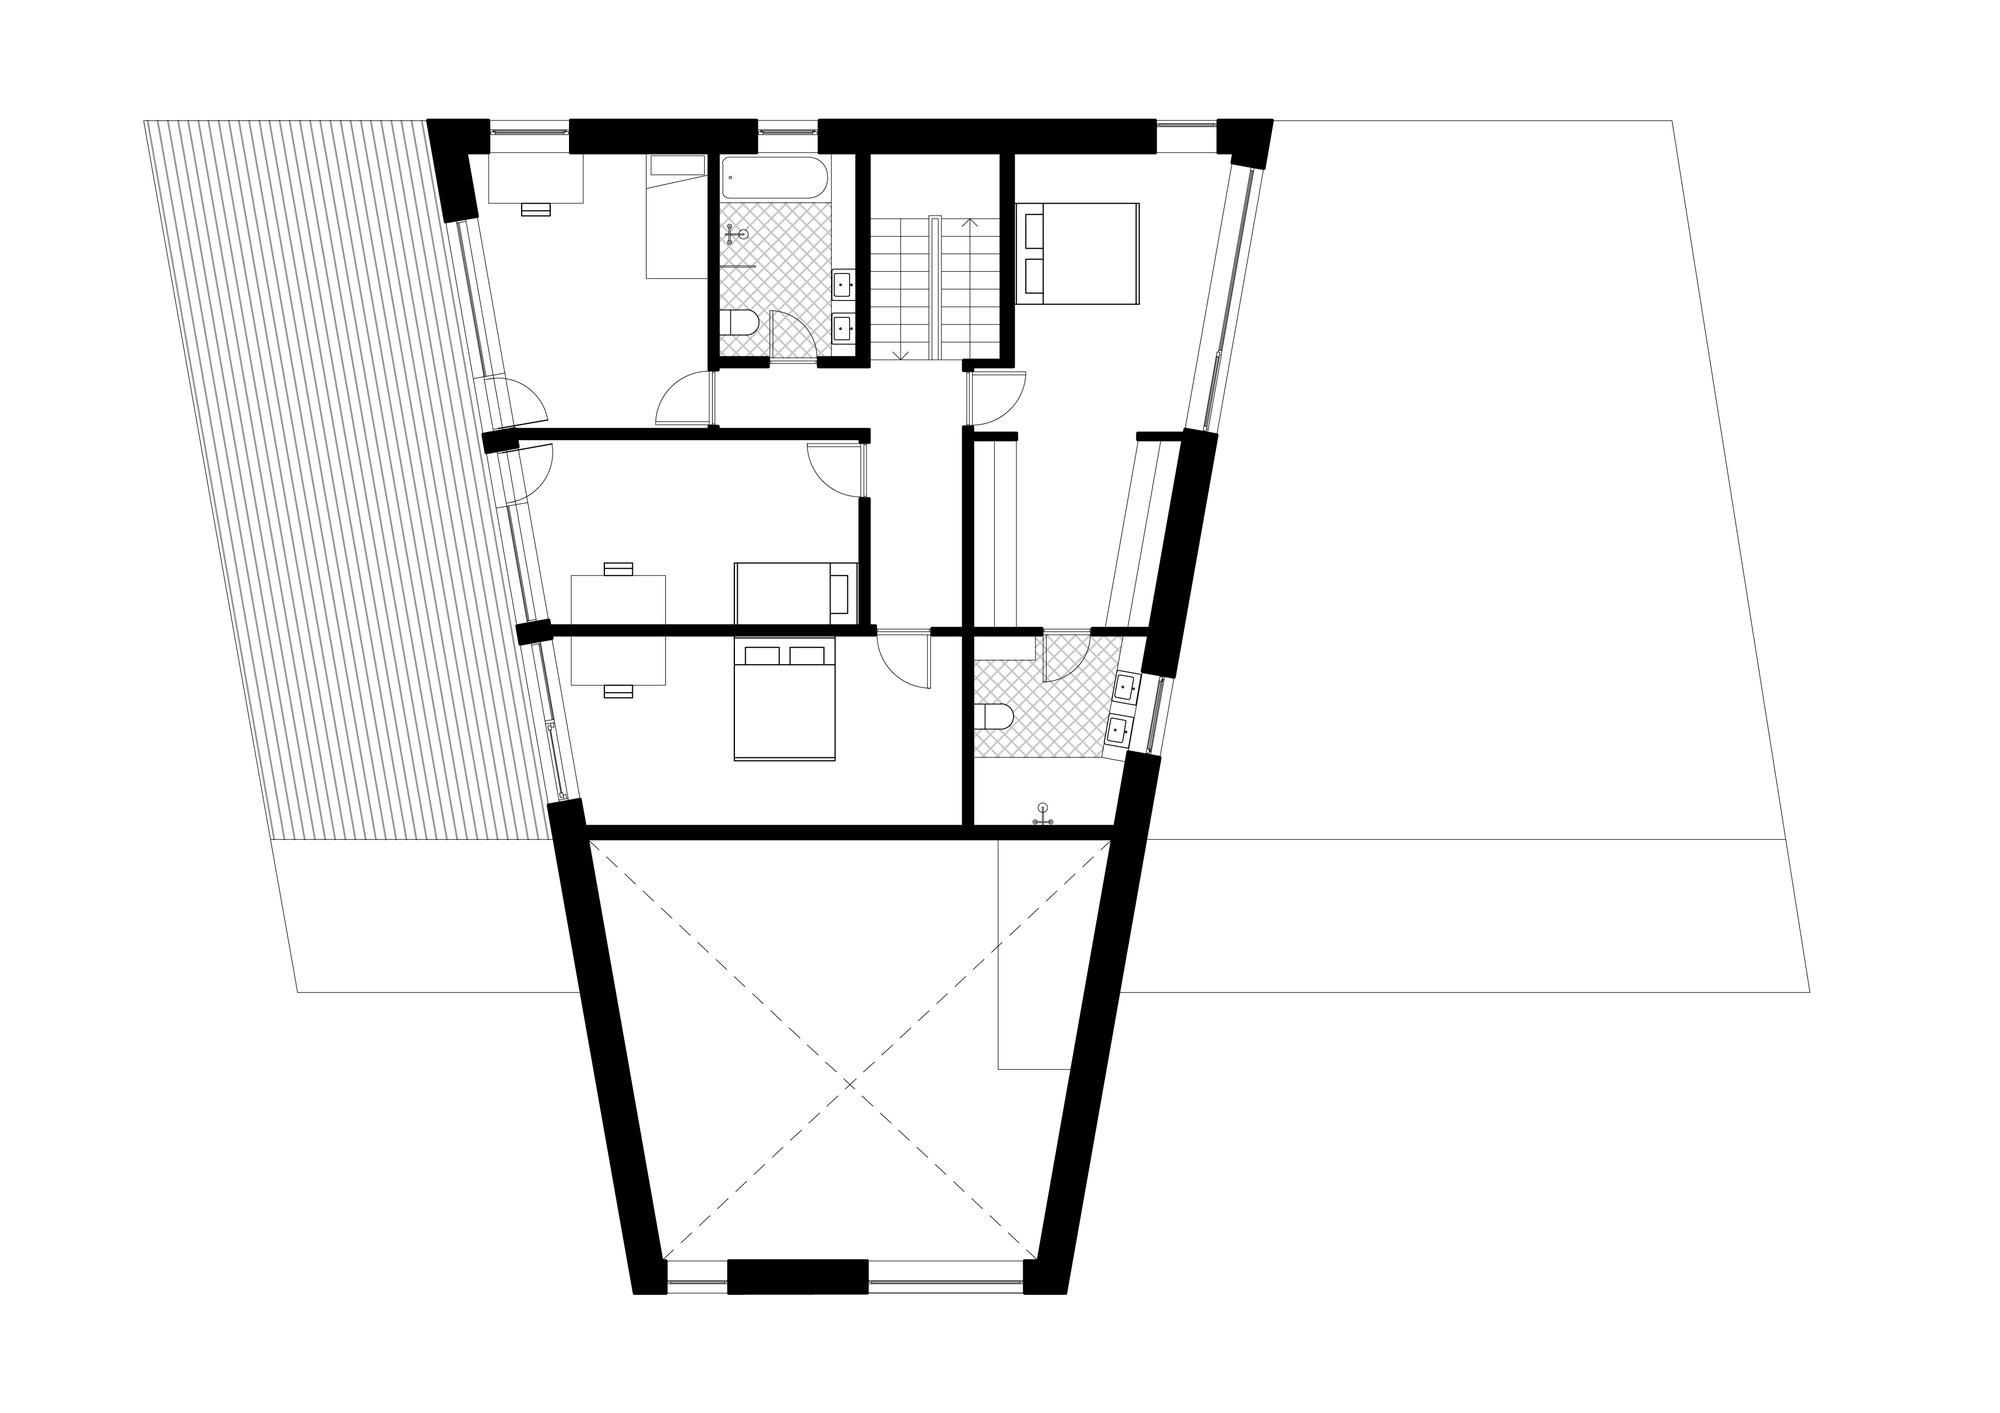 Galeria De Casa Em Pirita Kadarik T 252 252 R Arhitektid 25